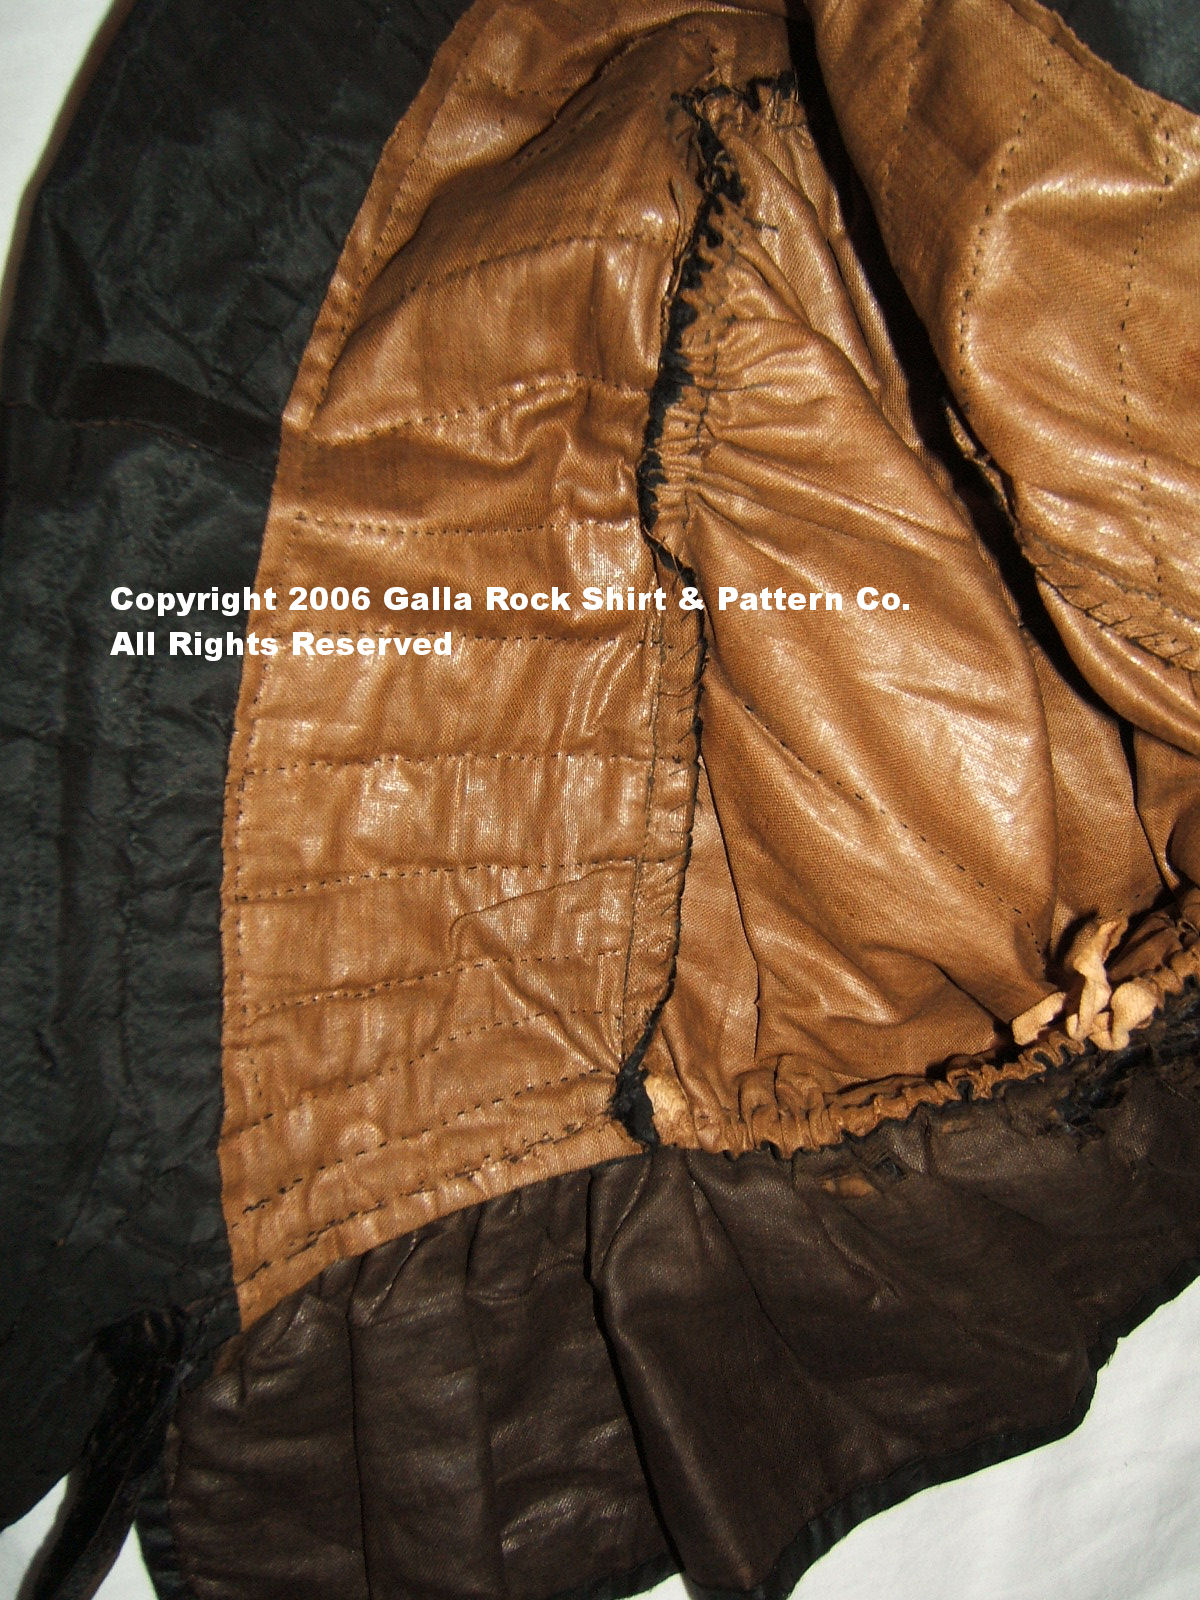 Galla Rock Civil War Shirt And Pattern Co